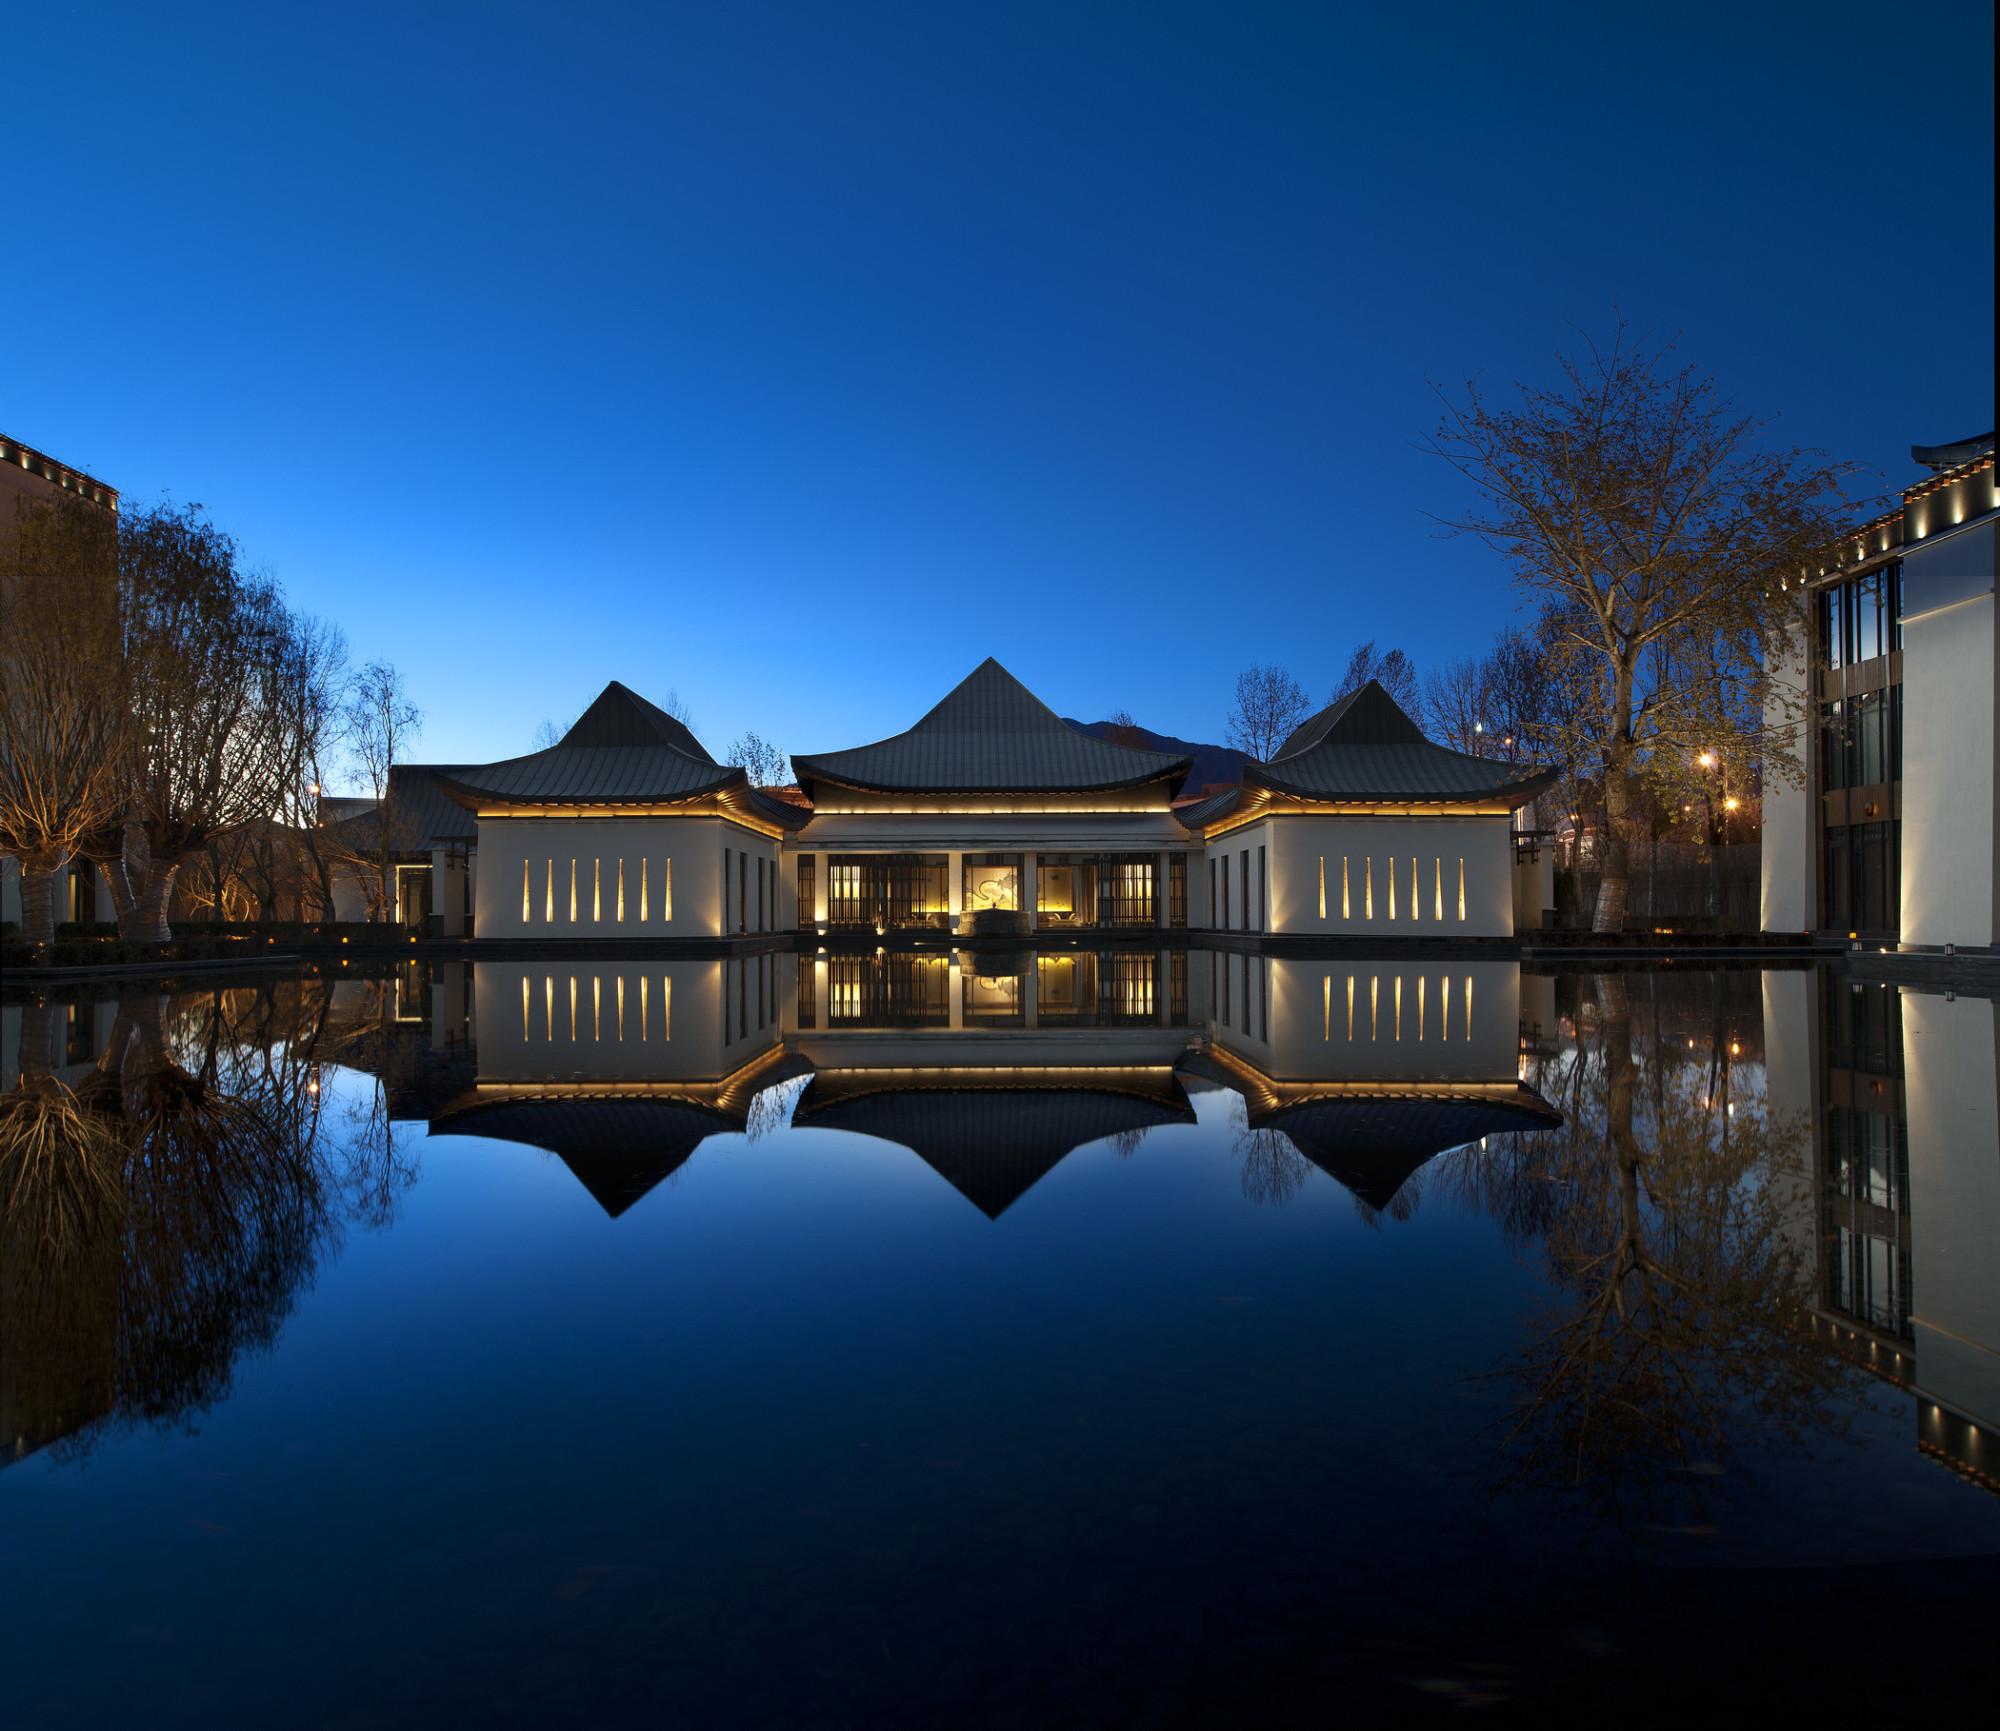 酒店夜景Garden-View-at-Night.jpg